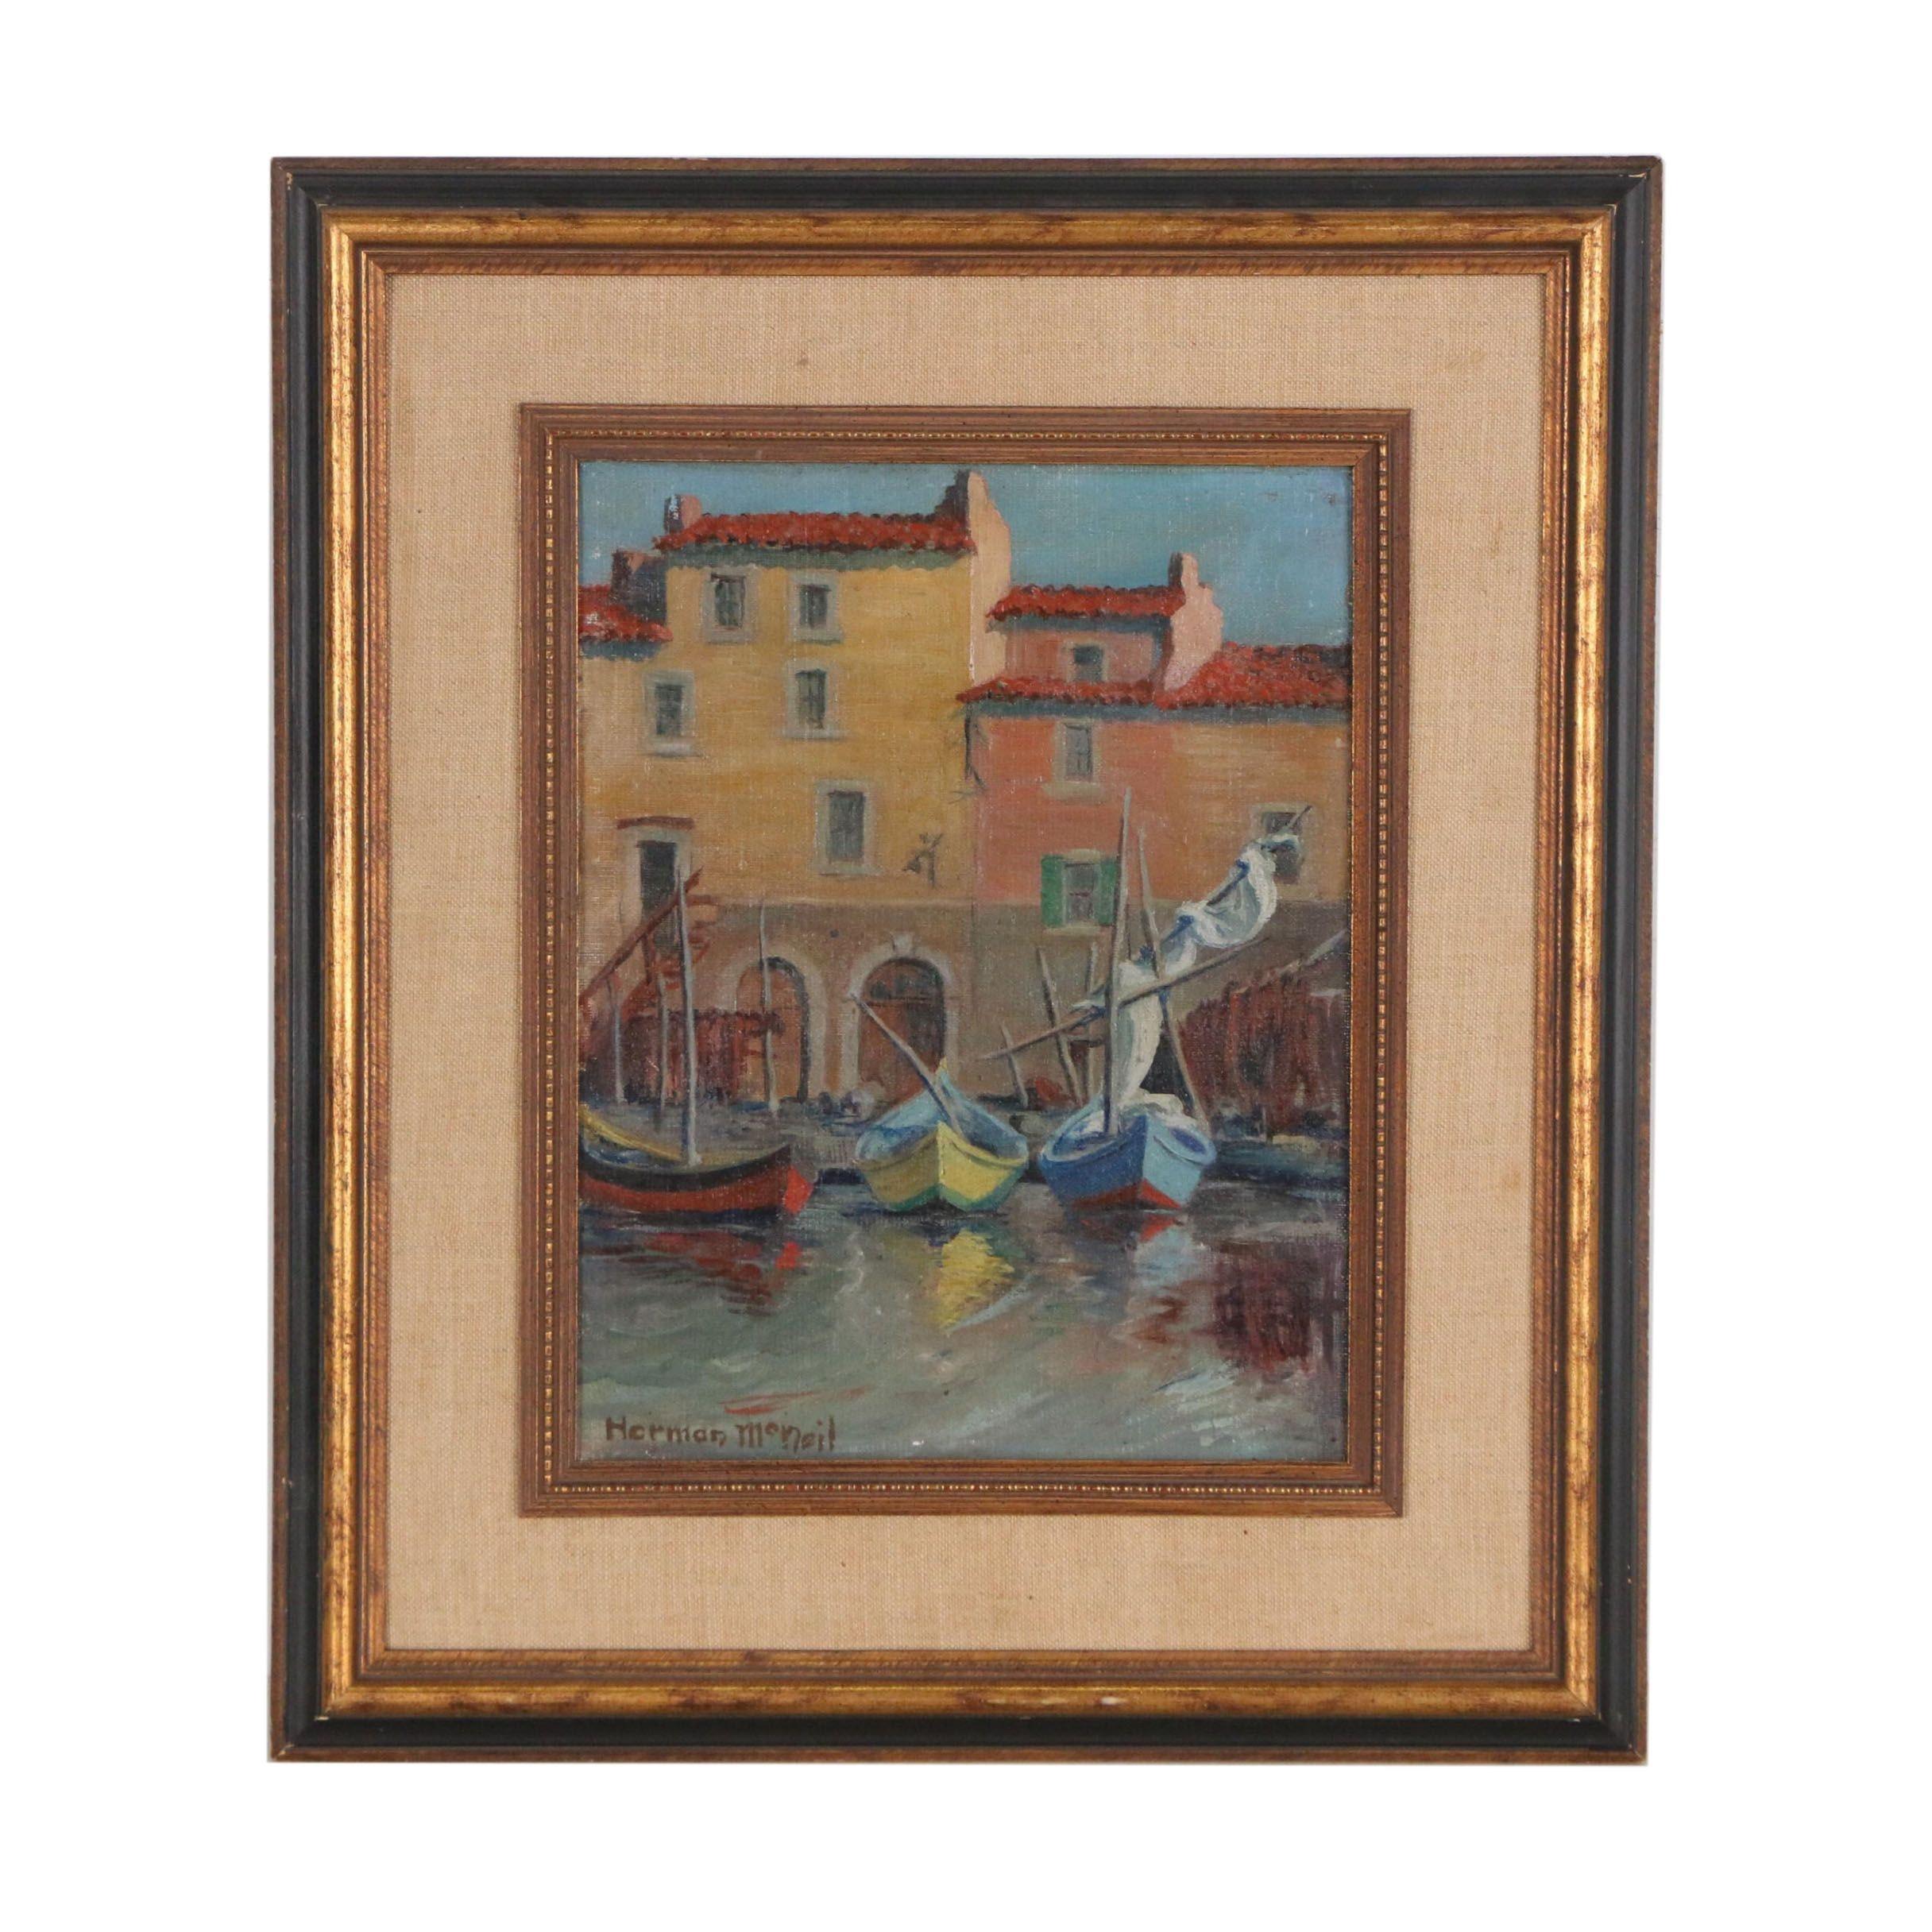 Herman McNeil Oil Painting of Harbor Scene